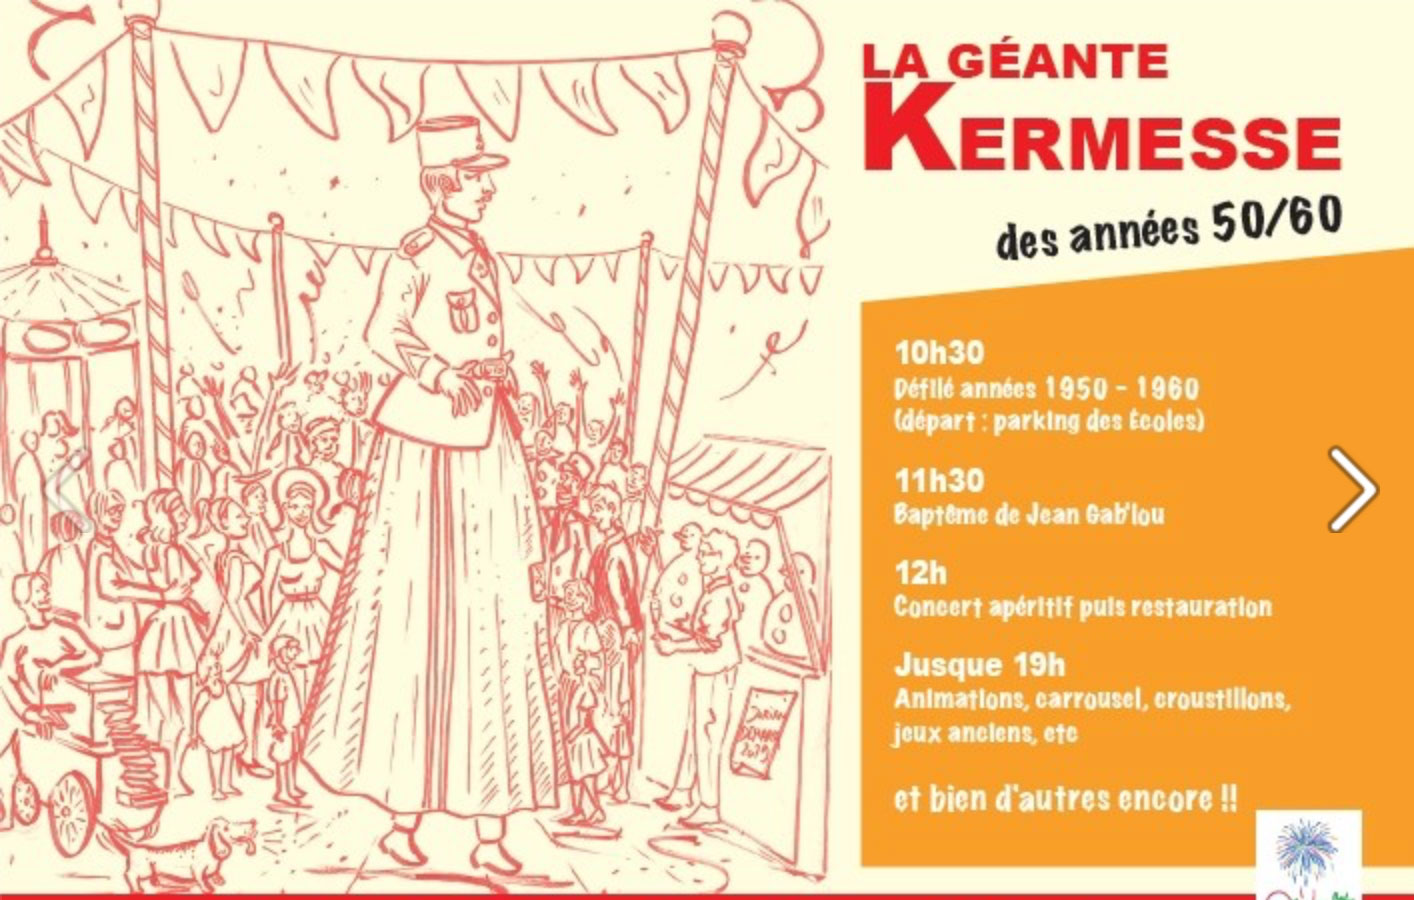 geante-kermesse-sailly-lez-lannoy